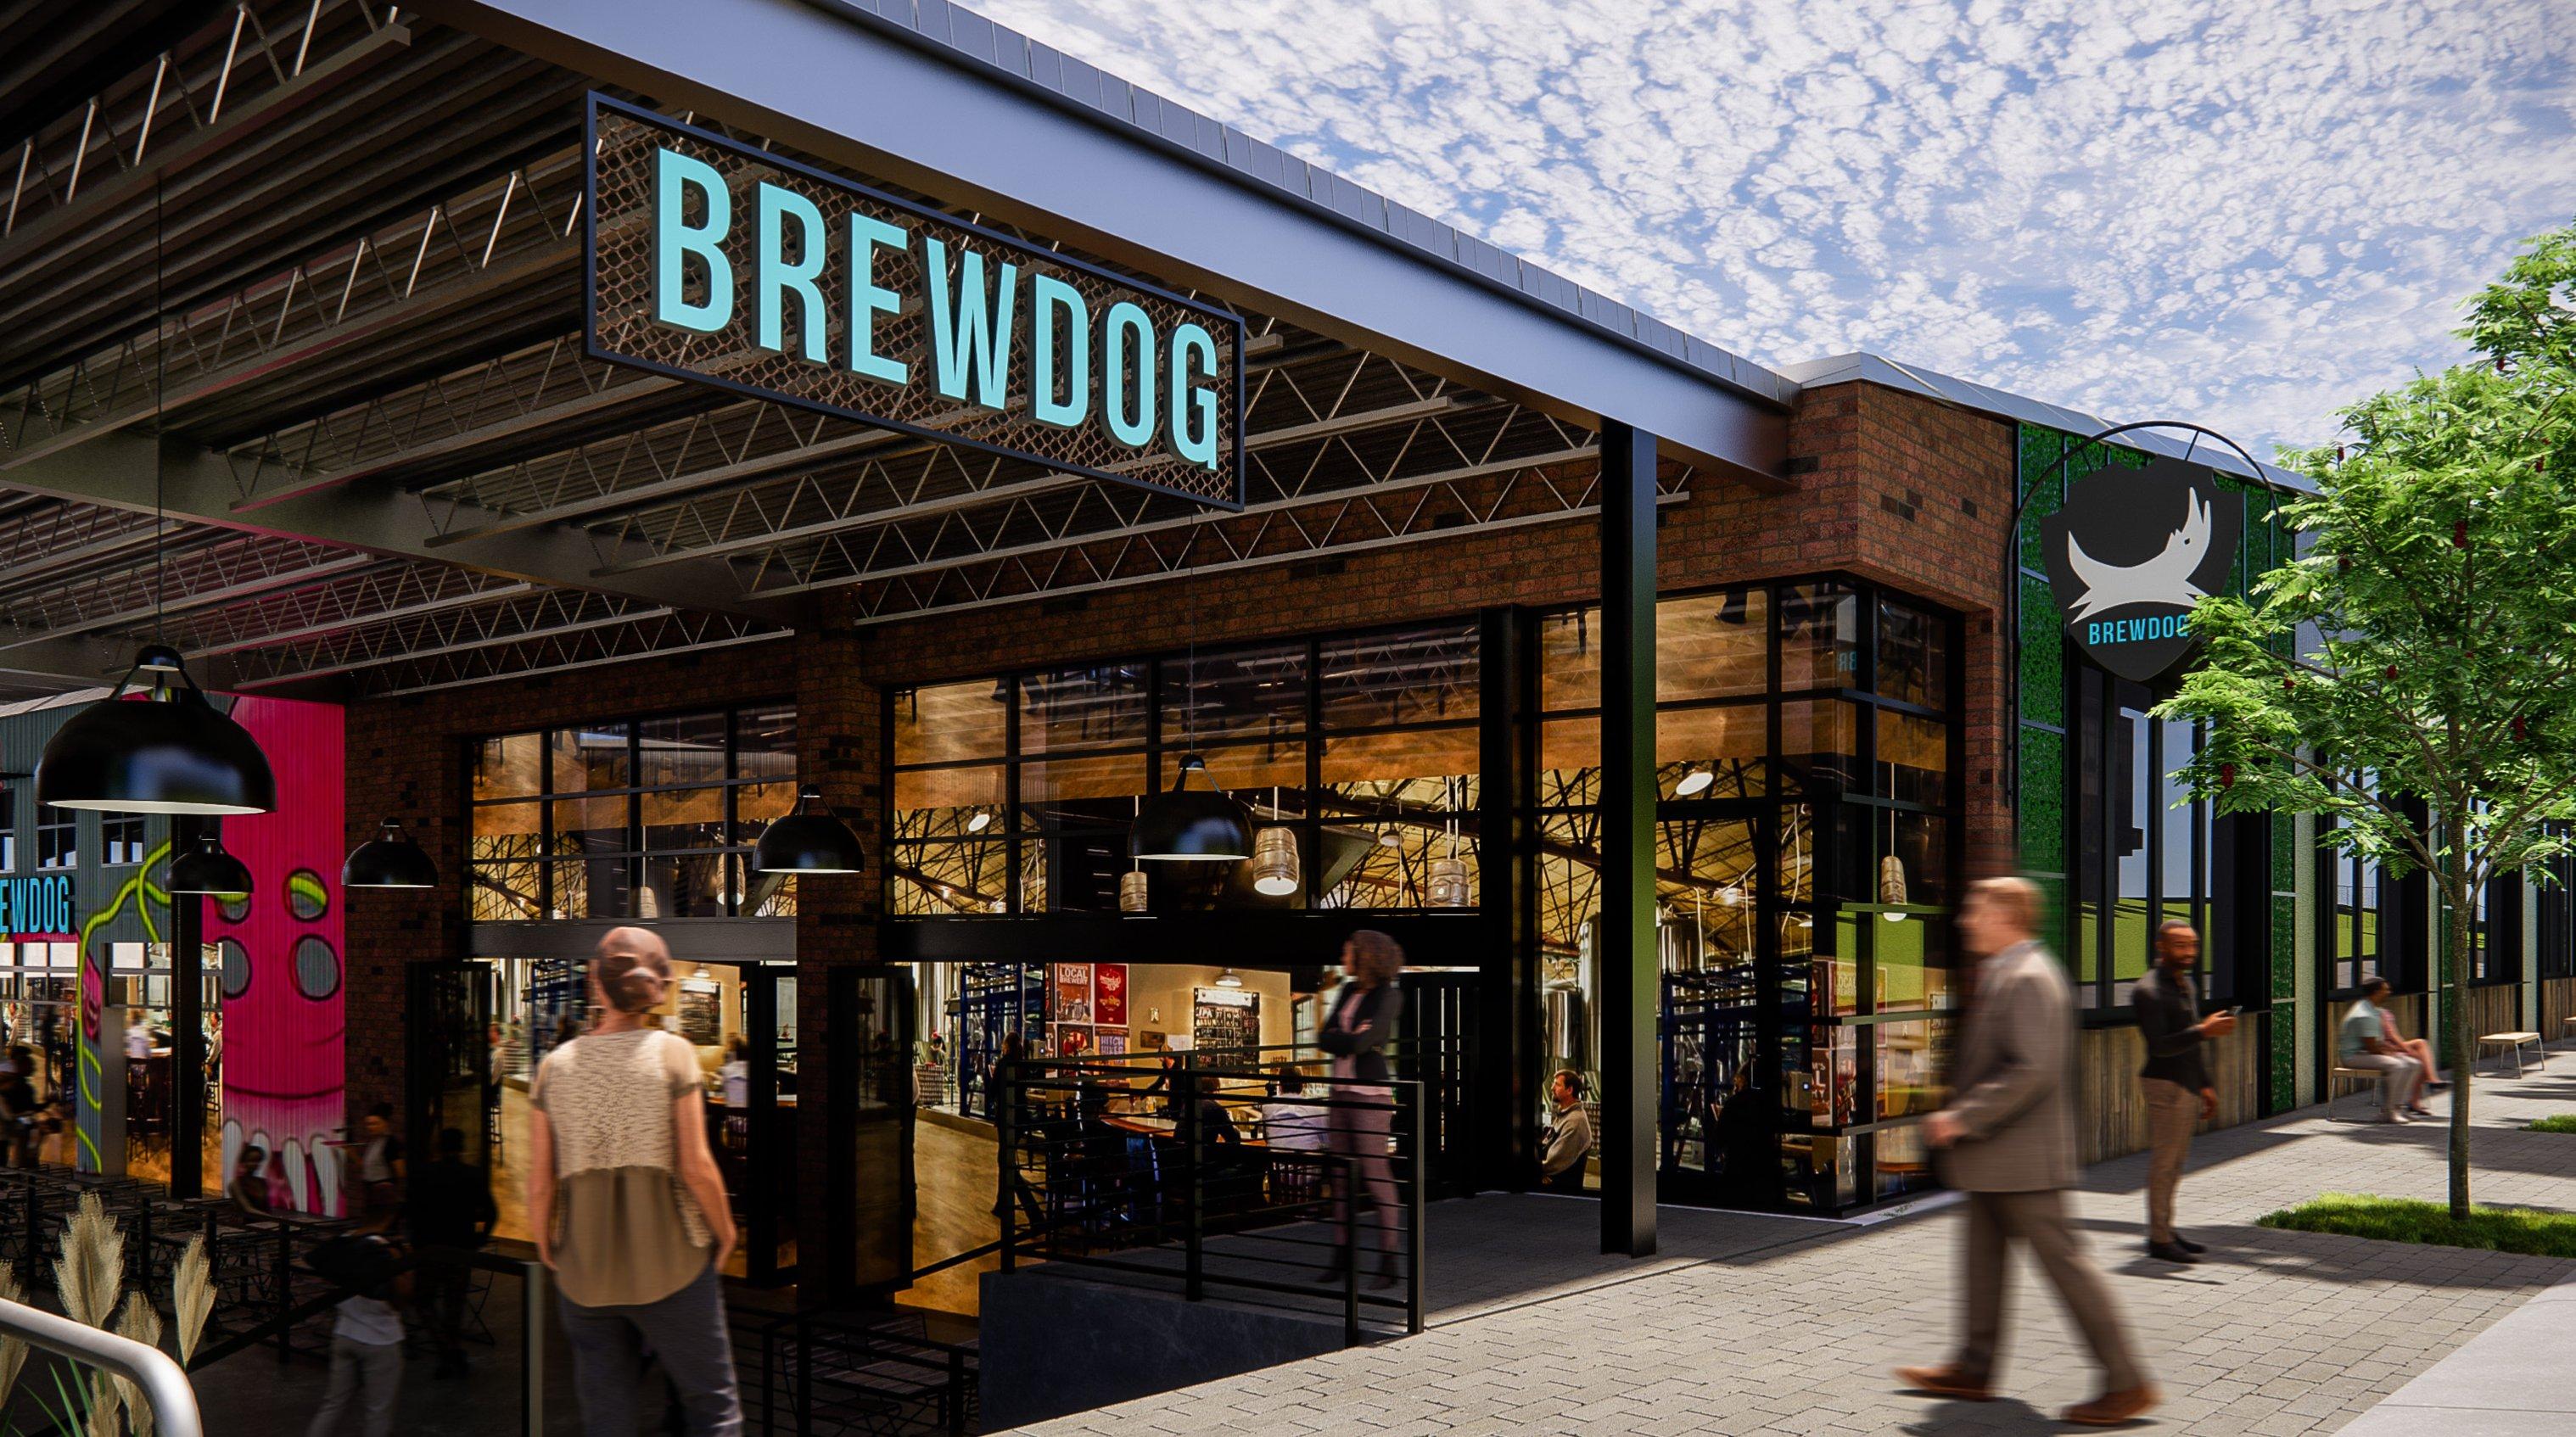 A mock-up of the new BrewDog bar in Atlanta.